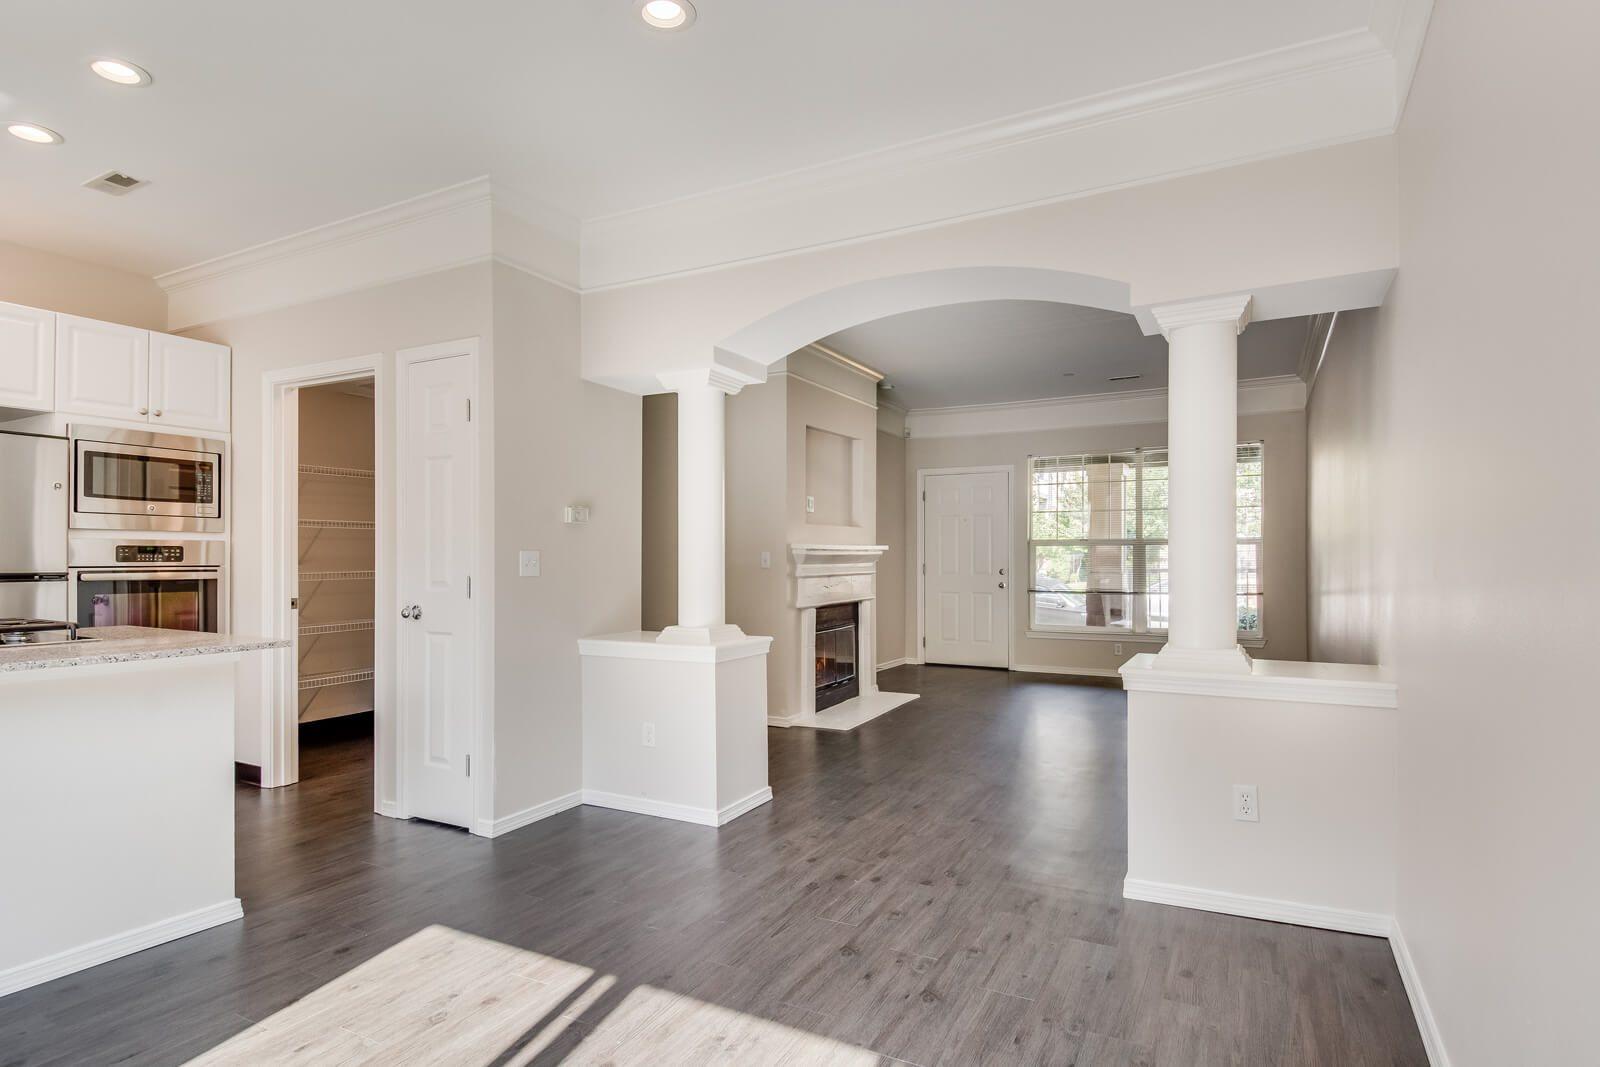 Unique, Interior Architectural Features at The Estates at Cougar Mountain, Issaquah, 98027